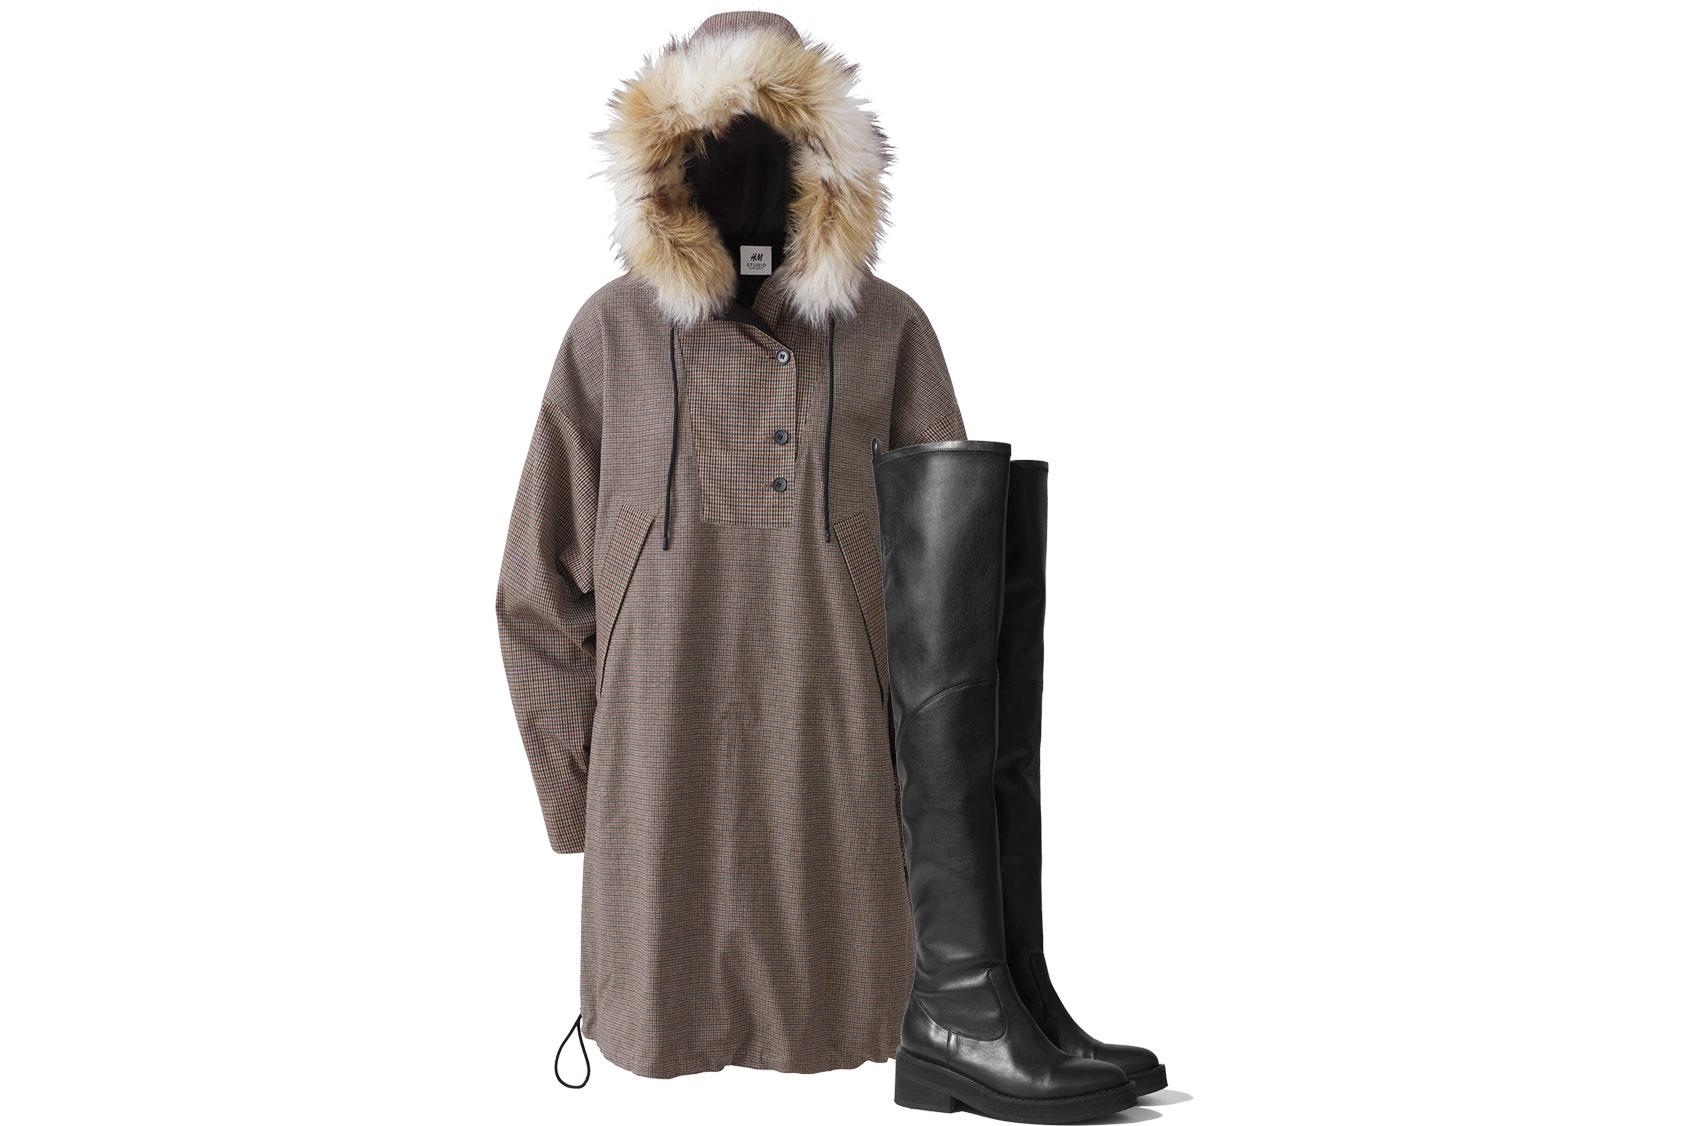 H&M STUDIO格子花呢外套和黑色過膝靴